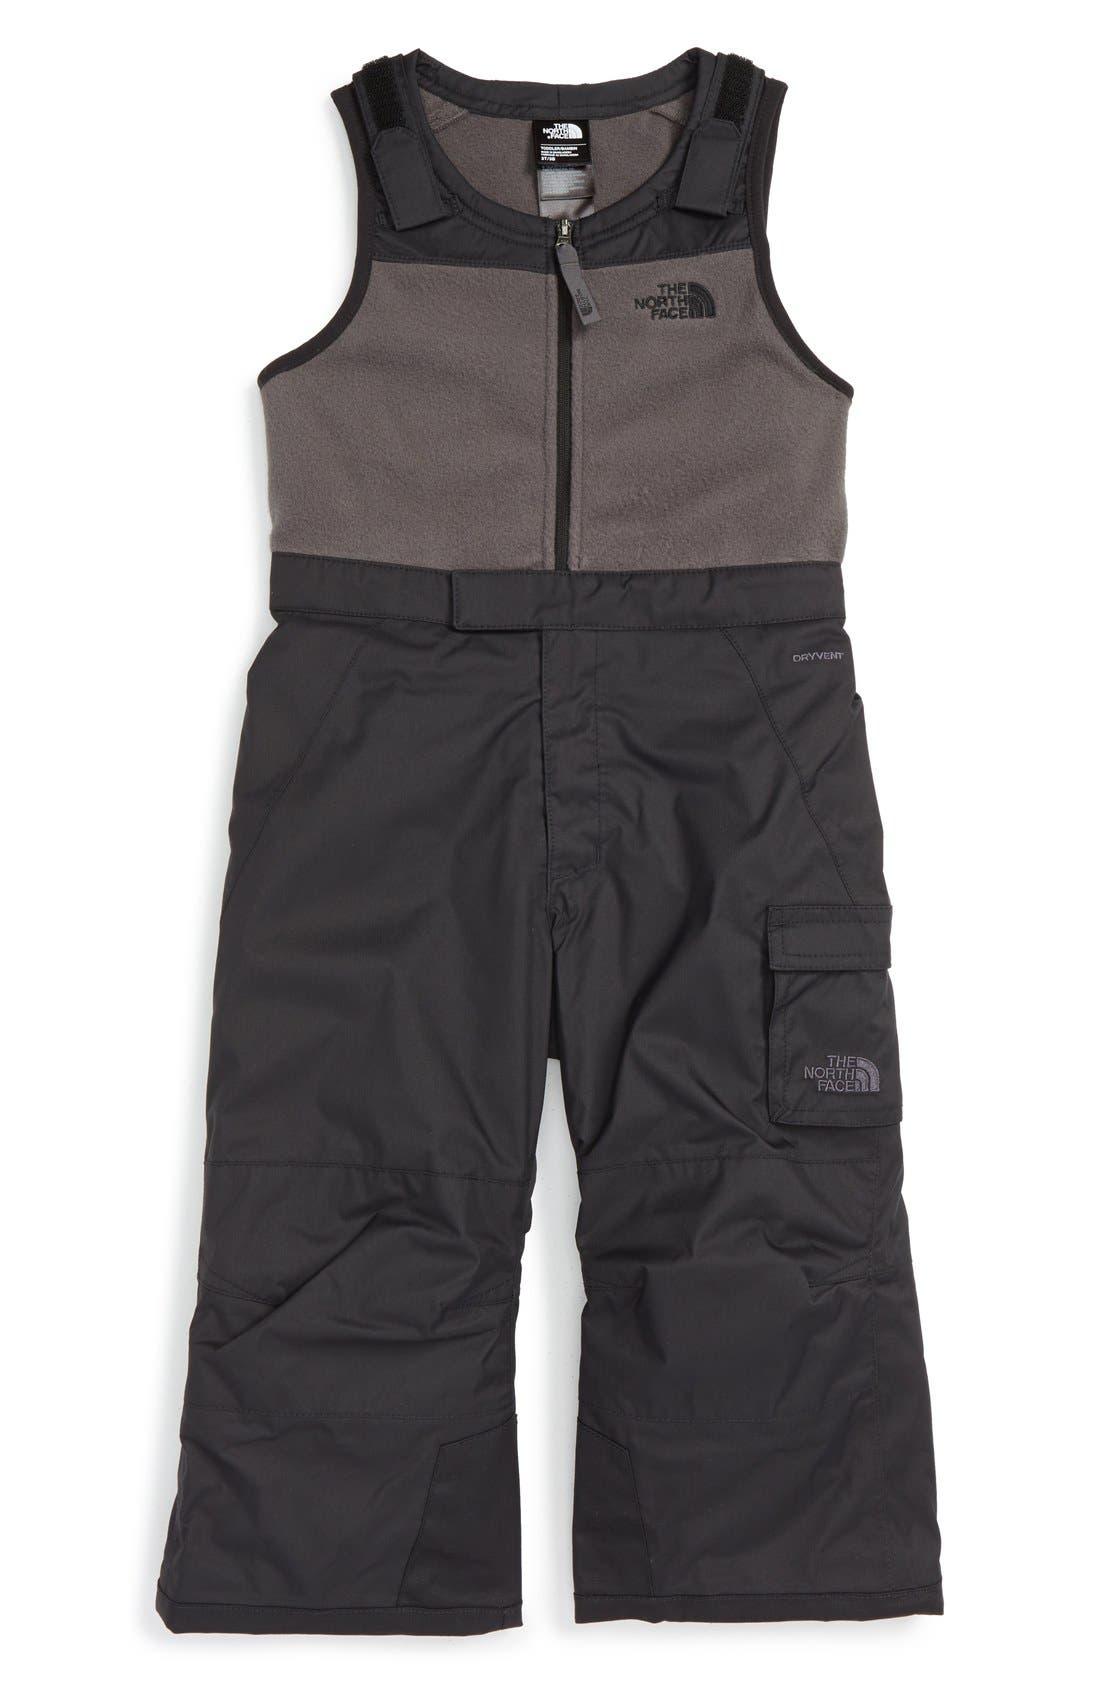 Main Image - The North Face Heekseeker™ Insulated Waterproof Bib Snowsuit (Toddler Boys & Little Boys)